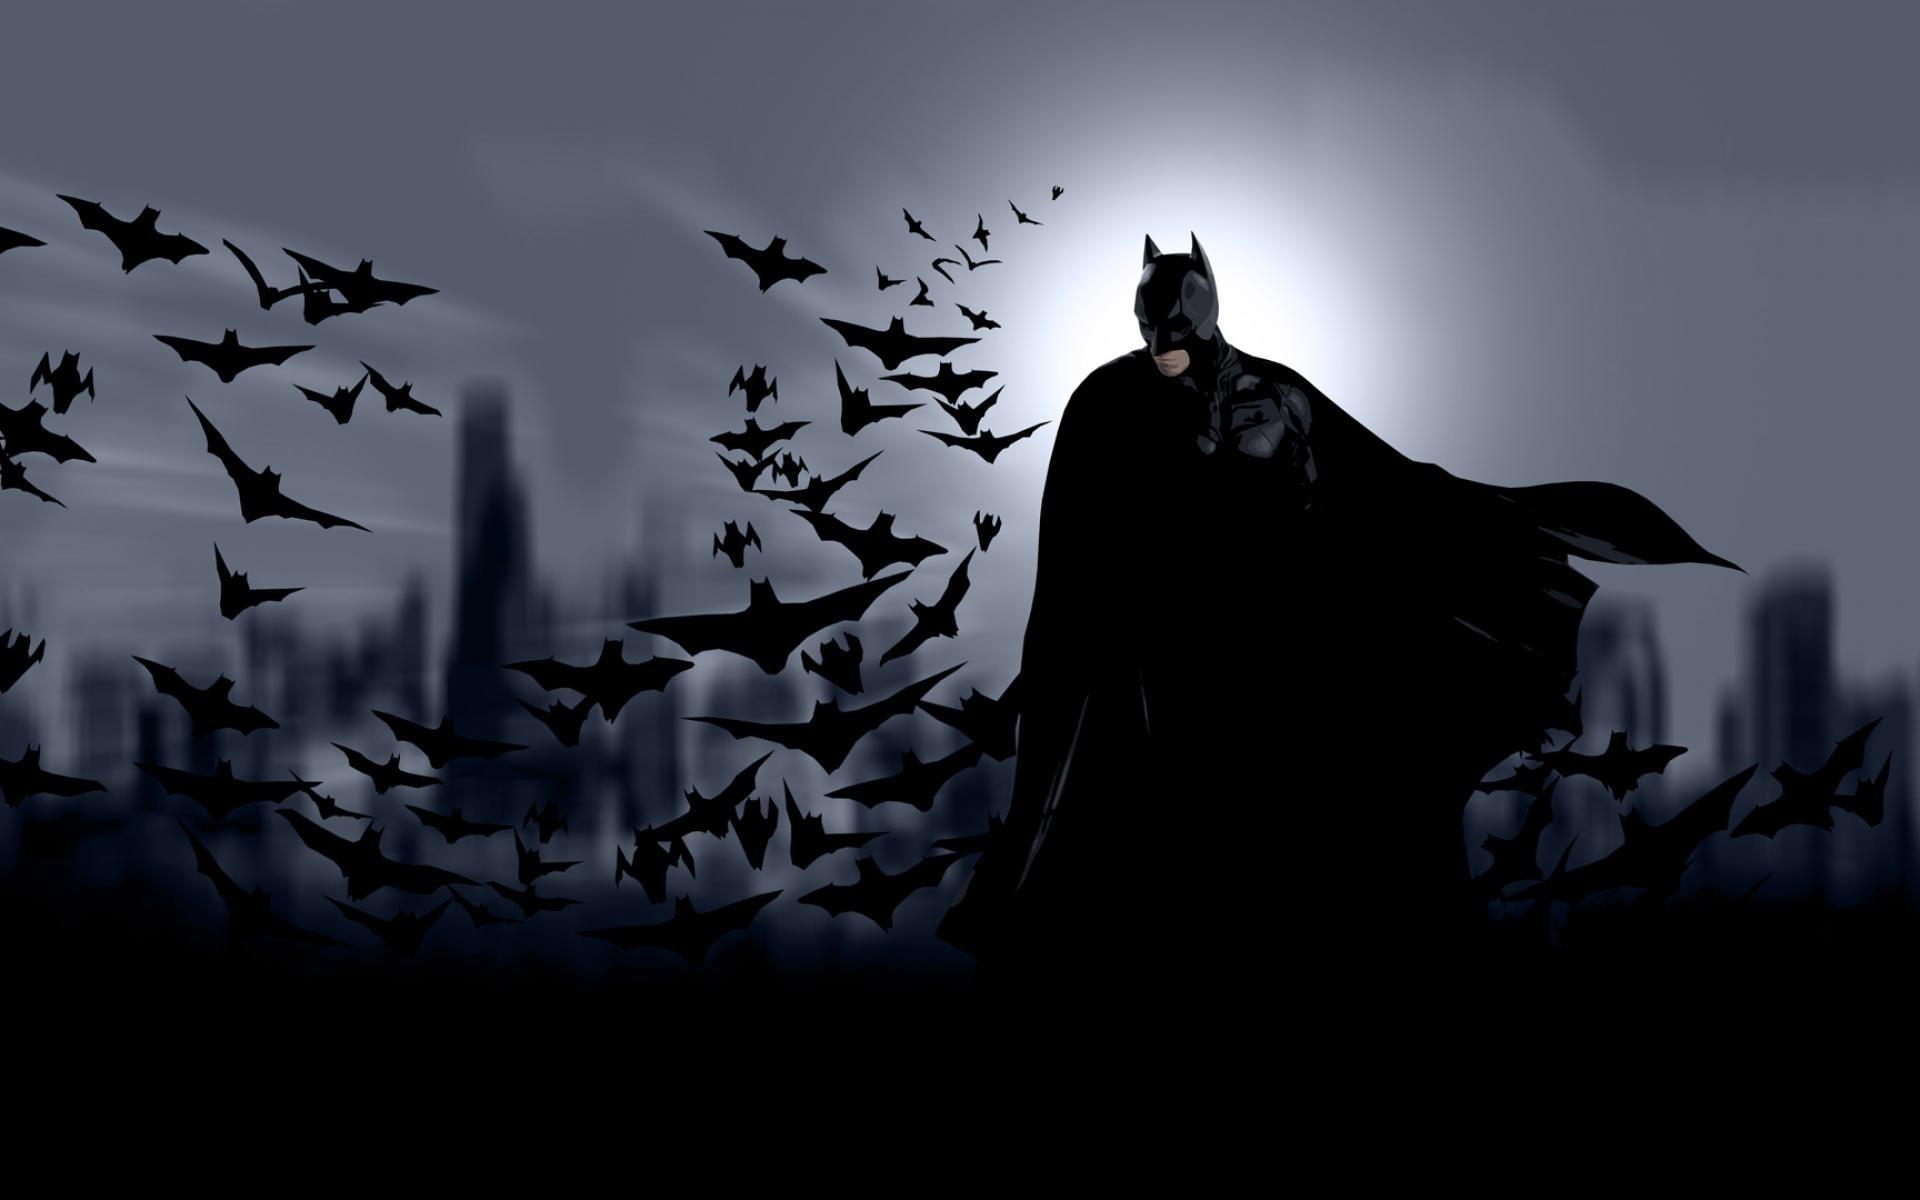 … Batman 4 4K Full Uhd Desktop Wallpaper | HD Wallpapers